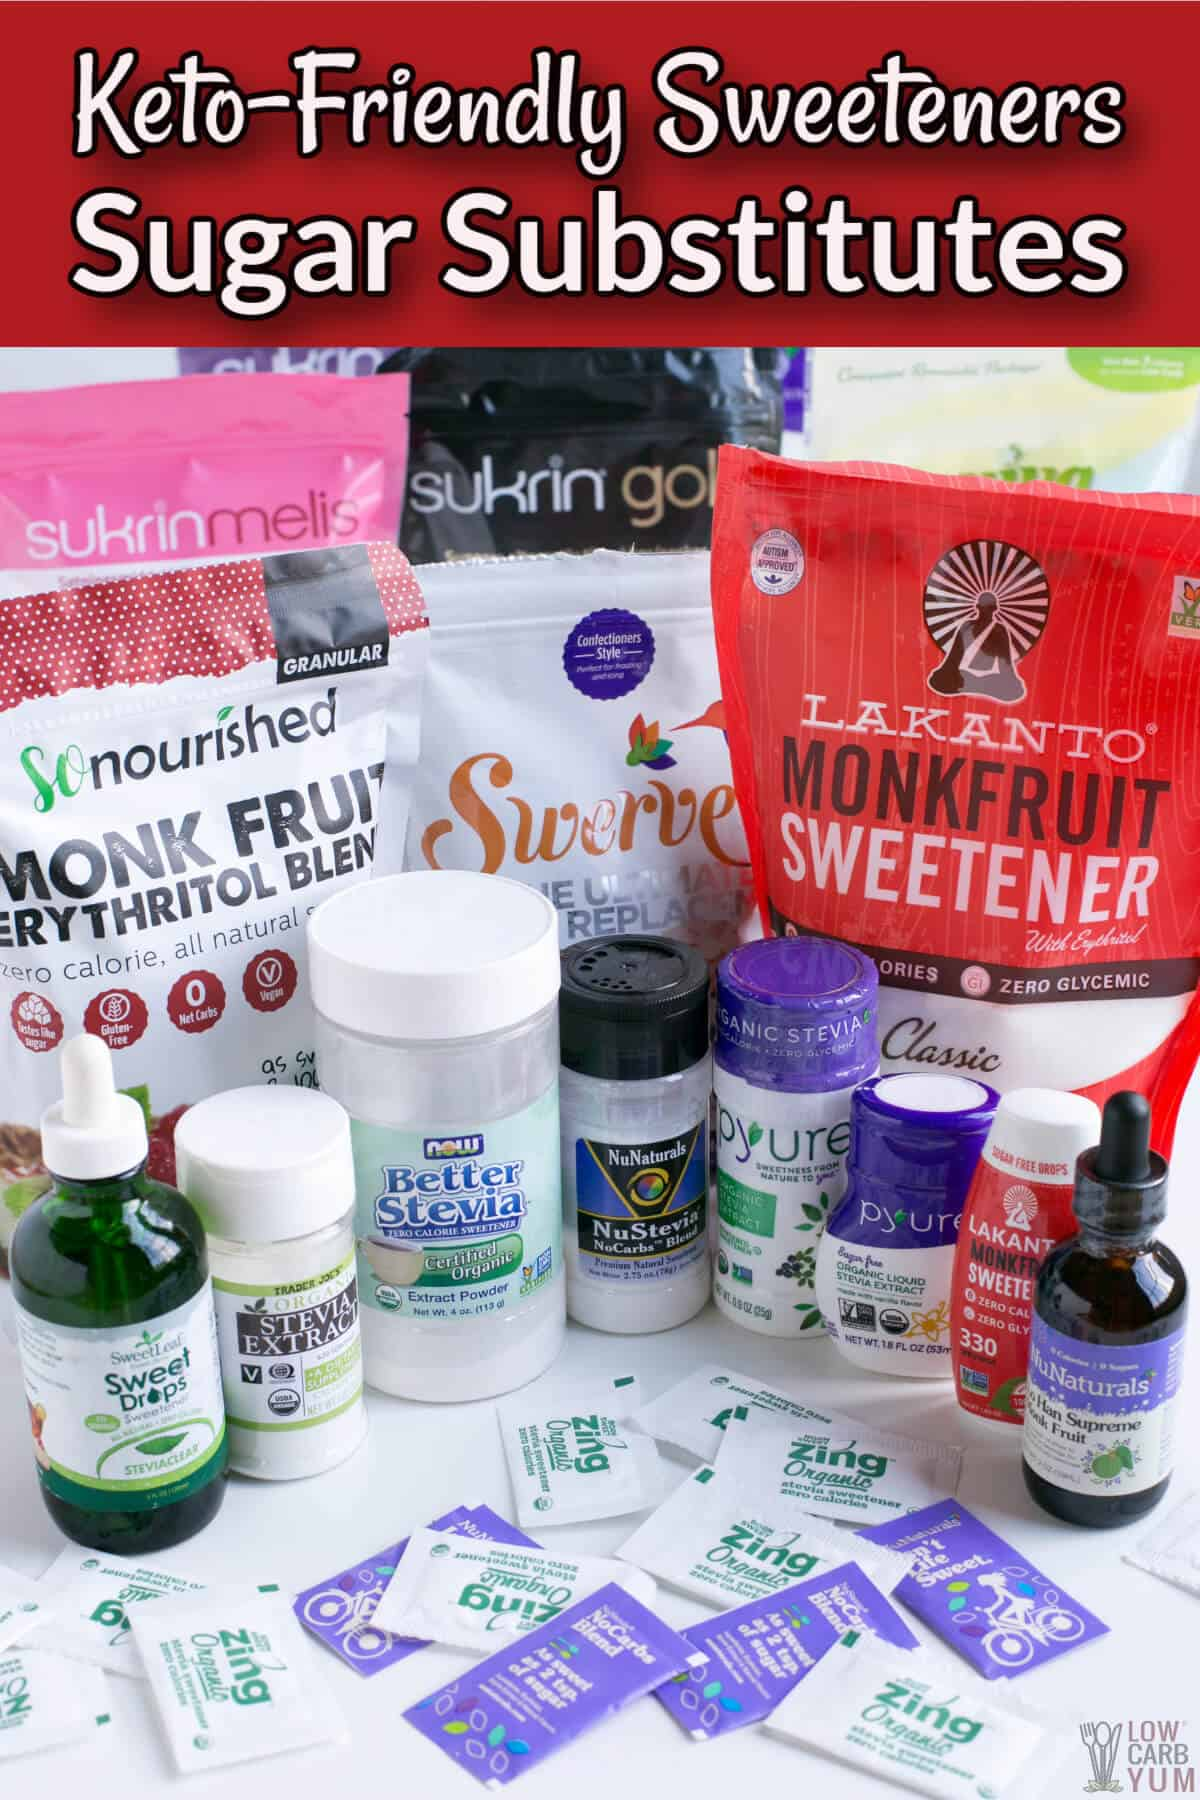 keto-friendly sweeteners sugar substitutes